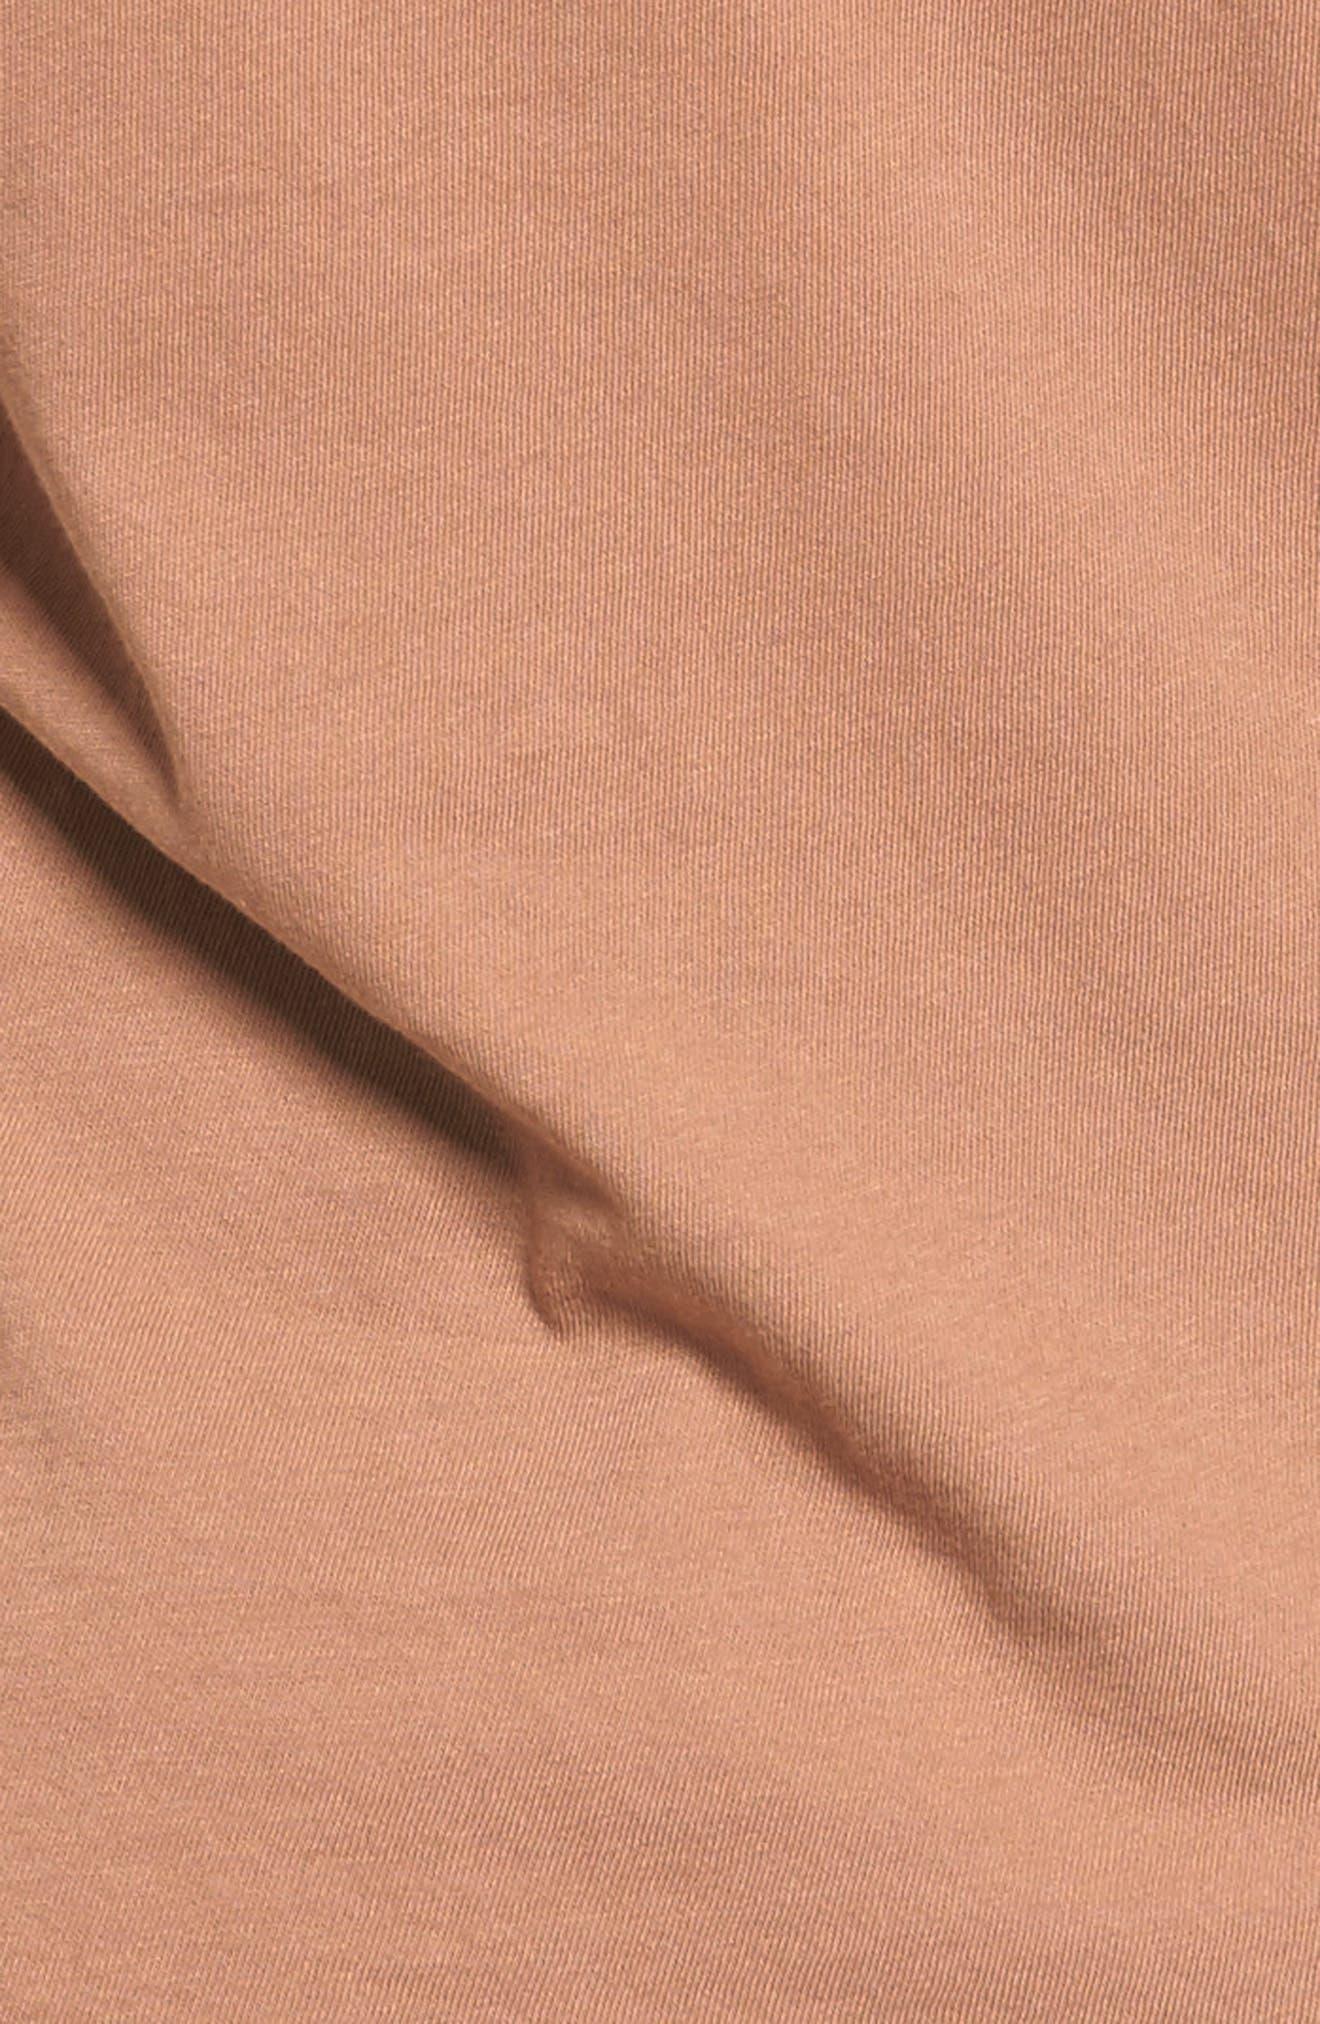 Easton Cutout Turtleneck,                             Alternate thumbnail 14, color,